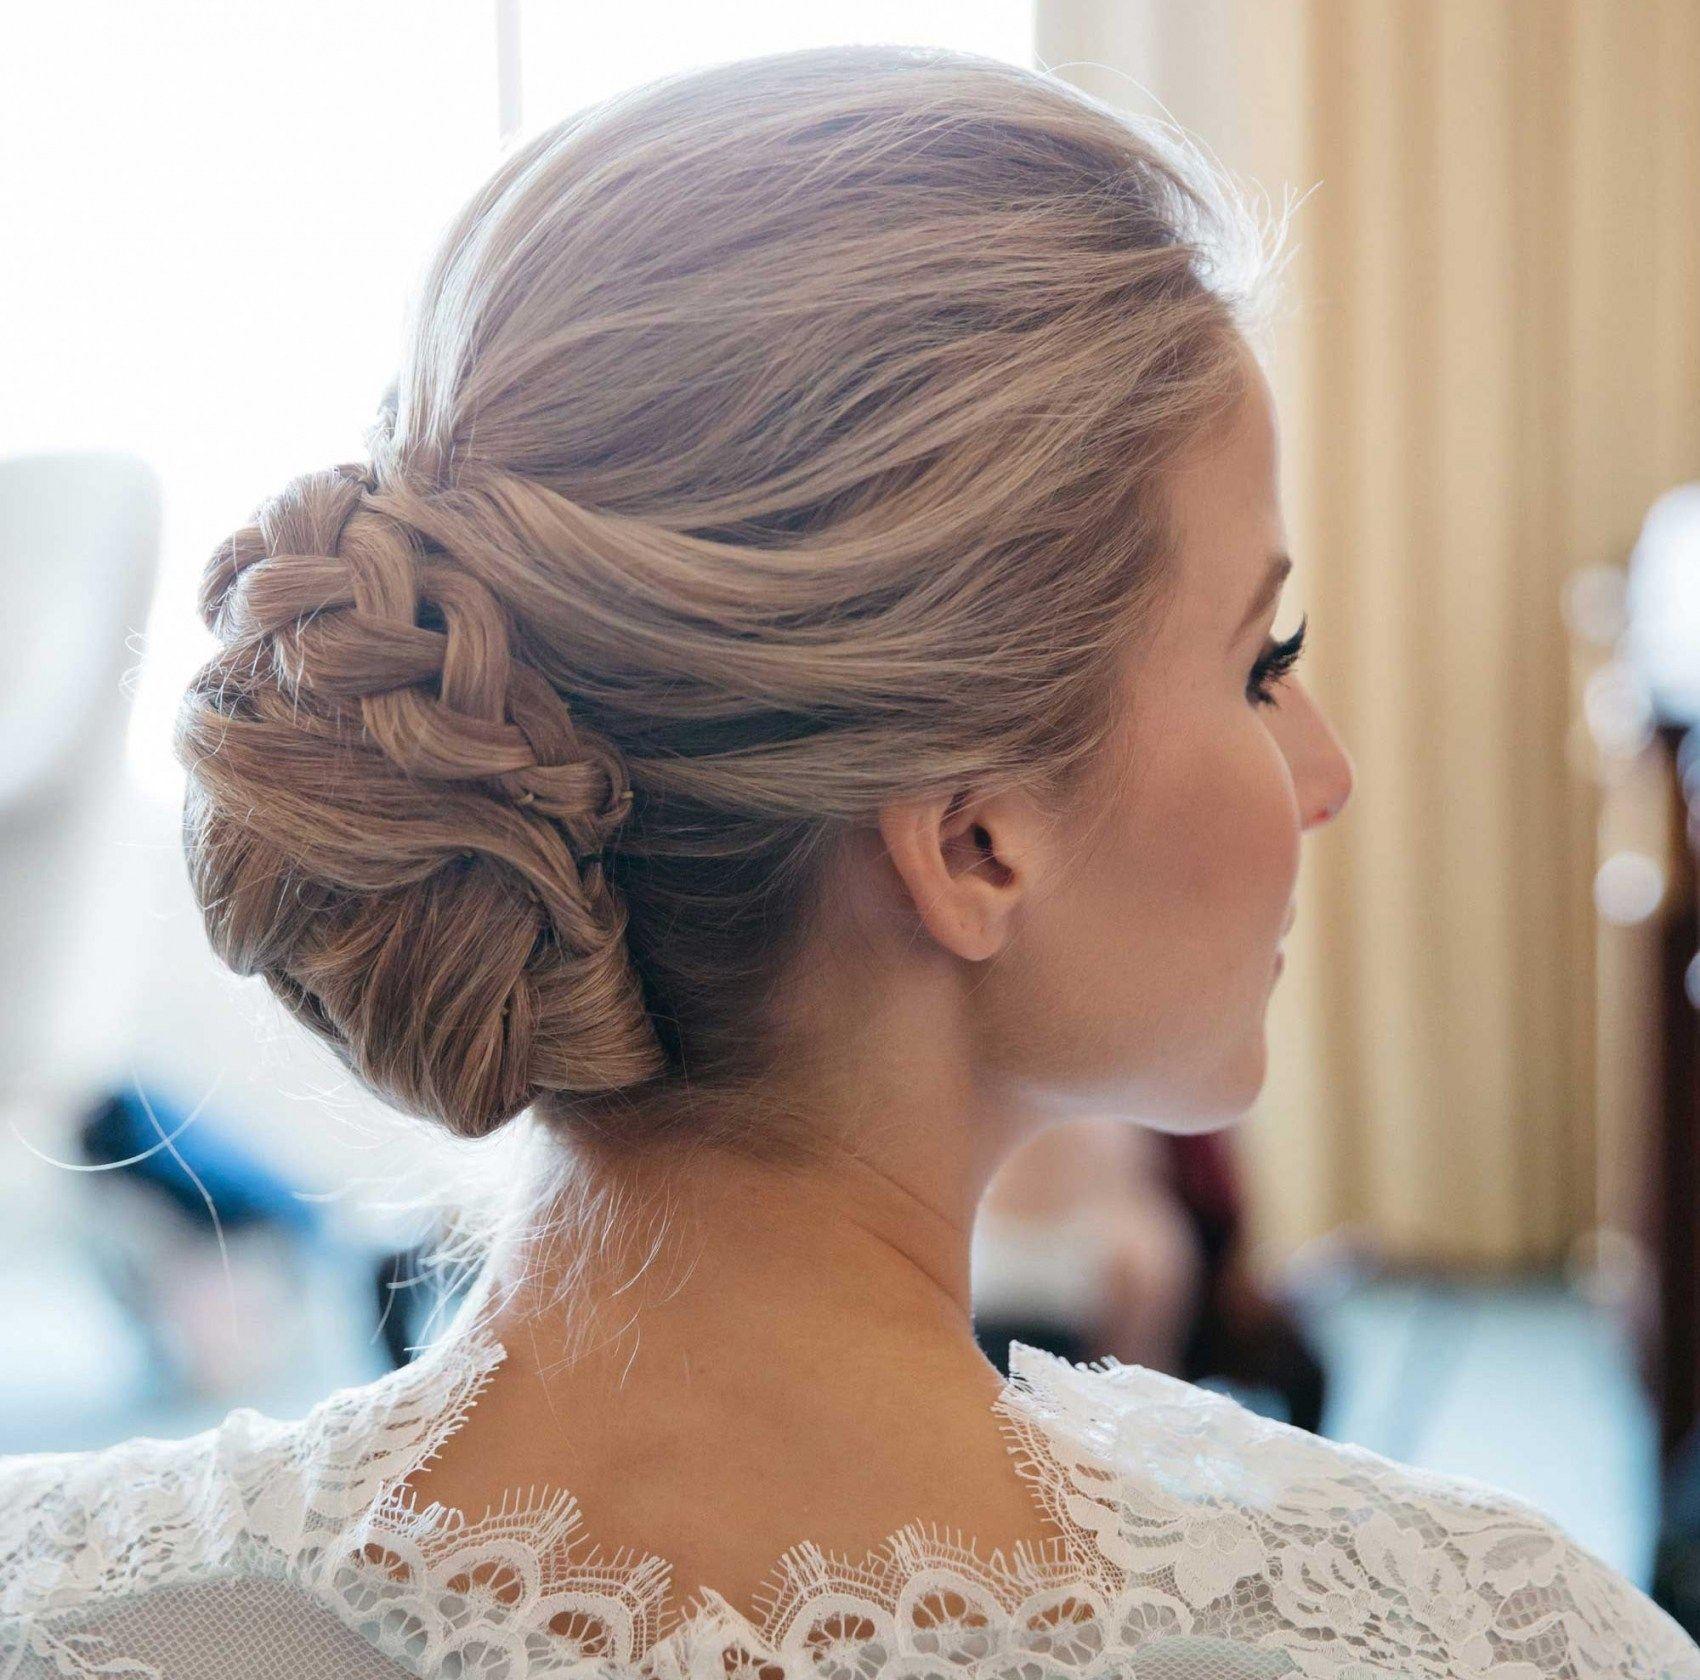 Braided Updo Hairstyles Extraordinary Wedding Hairstyles Braided Updos  Hairstyles Ideas For Me